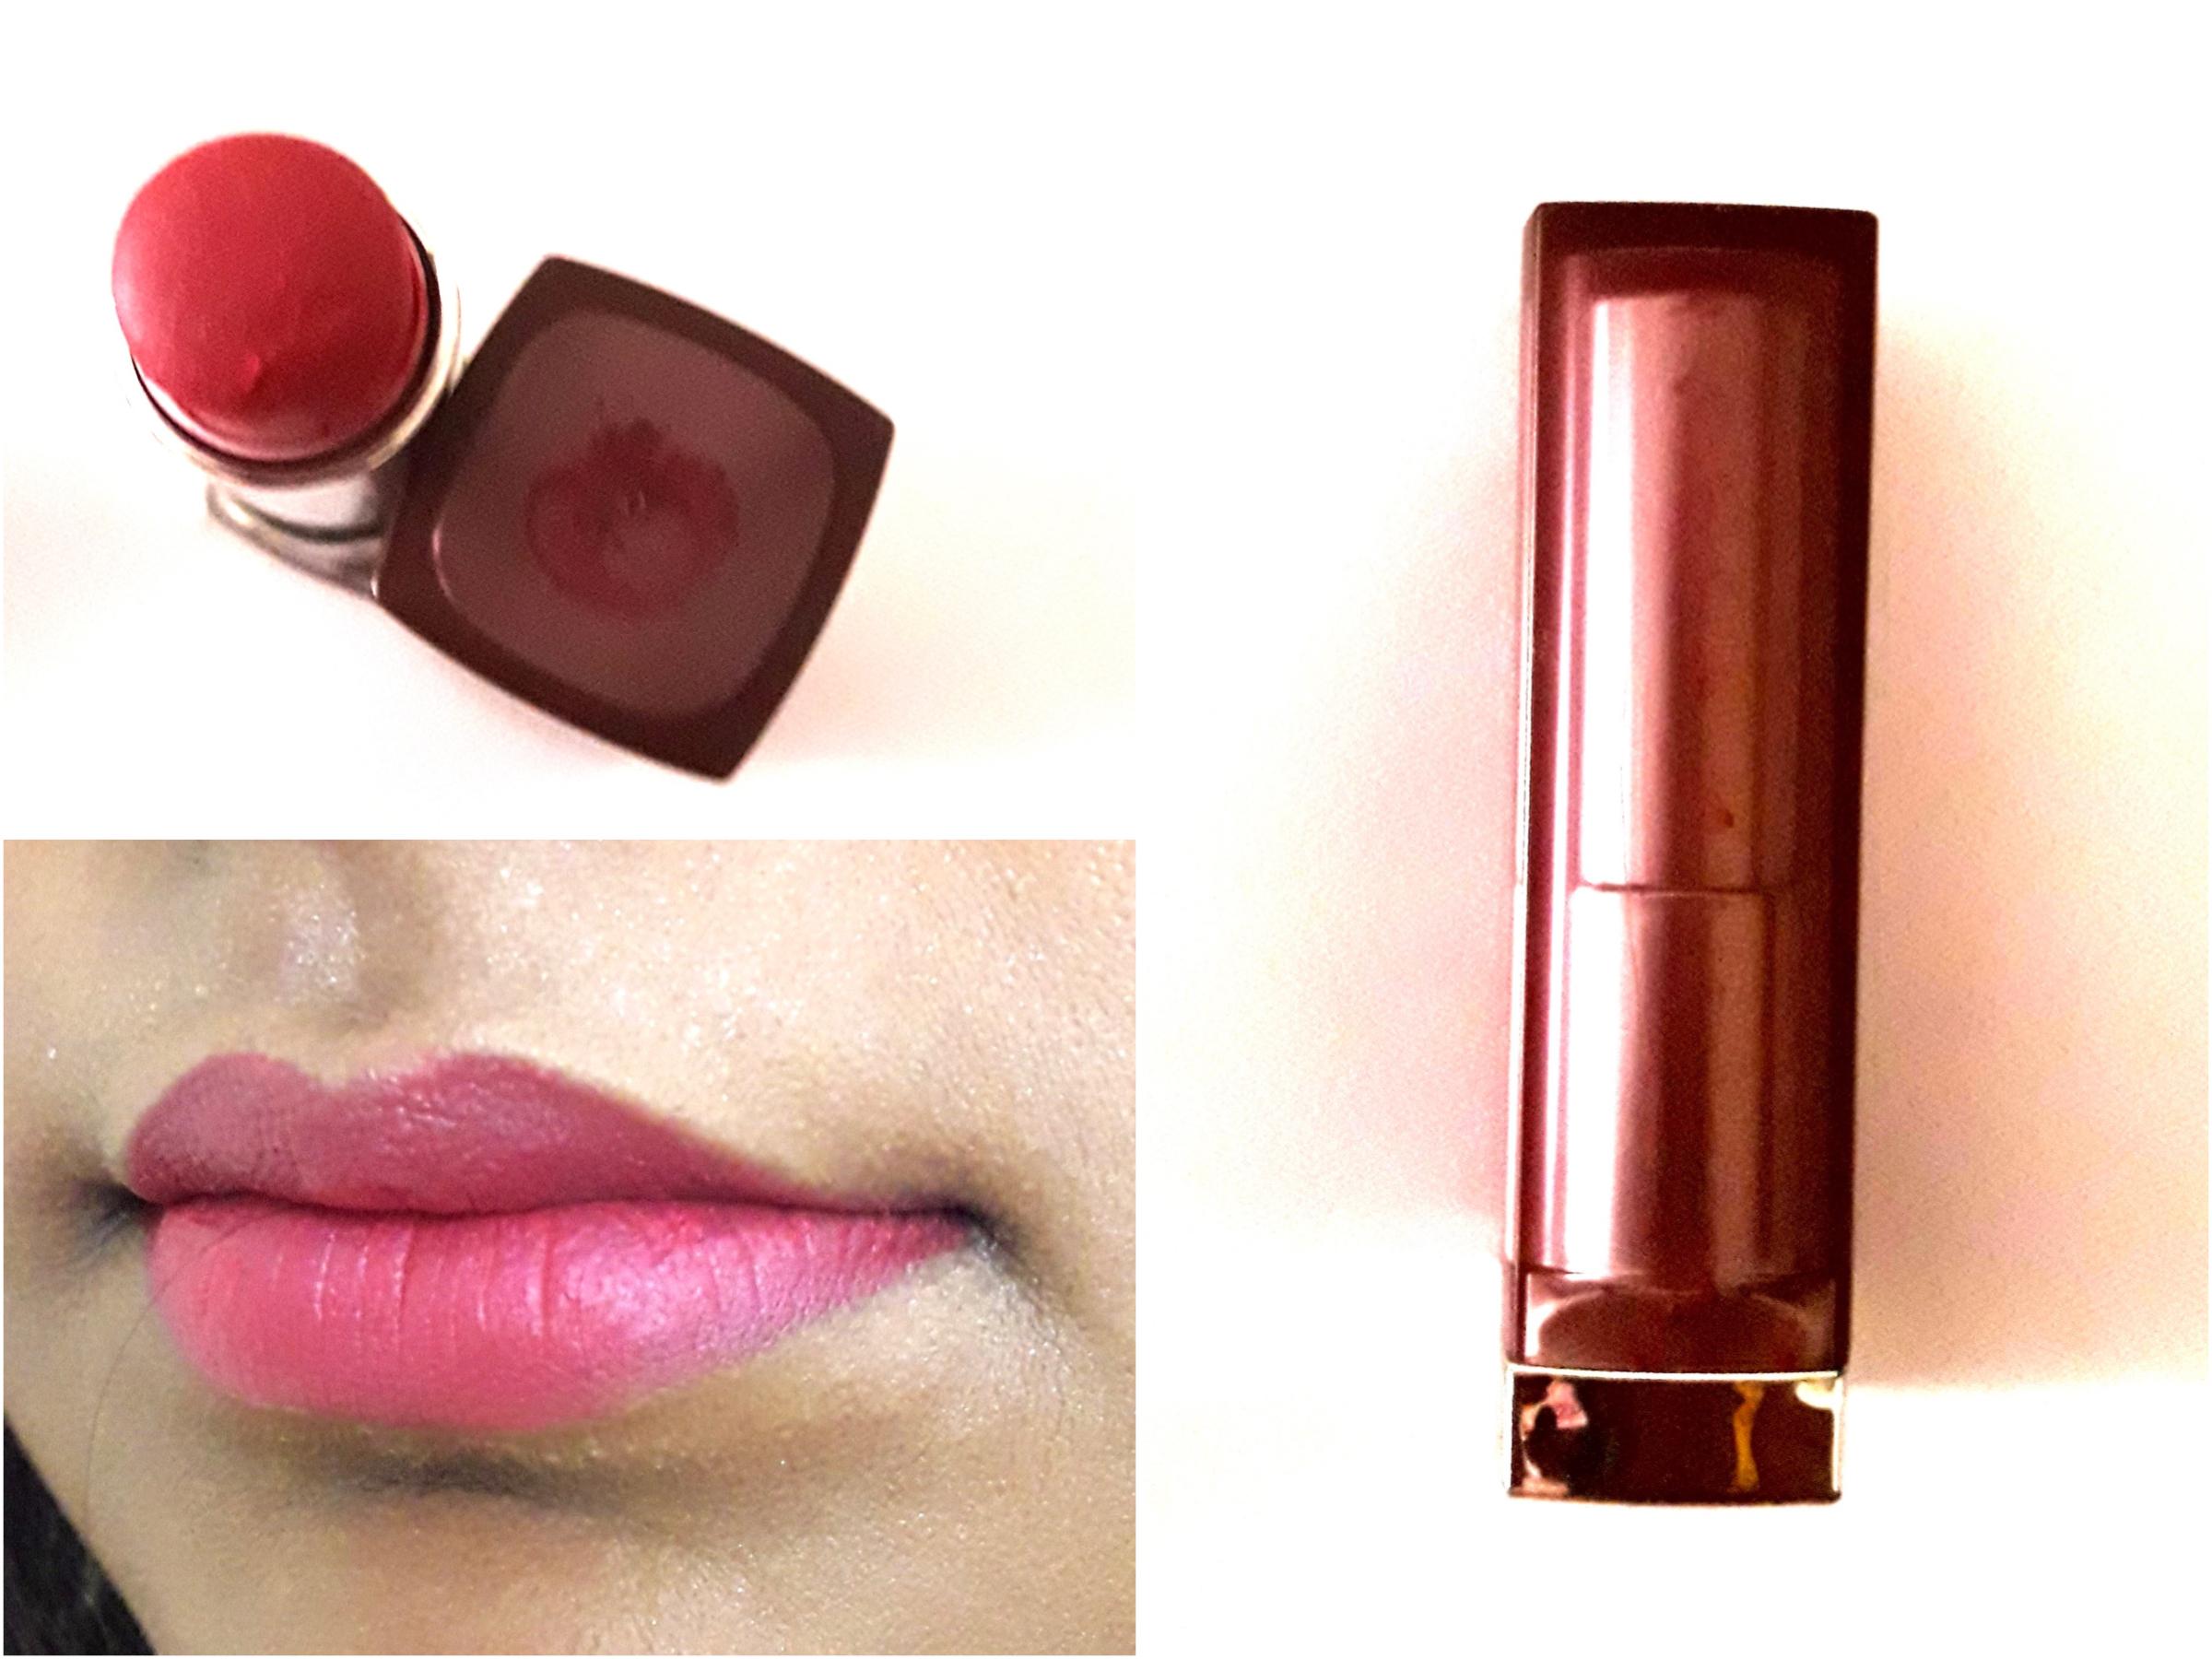 Maybelline Creamy Matte Lipstick Mesmerizing Magenta